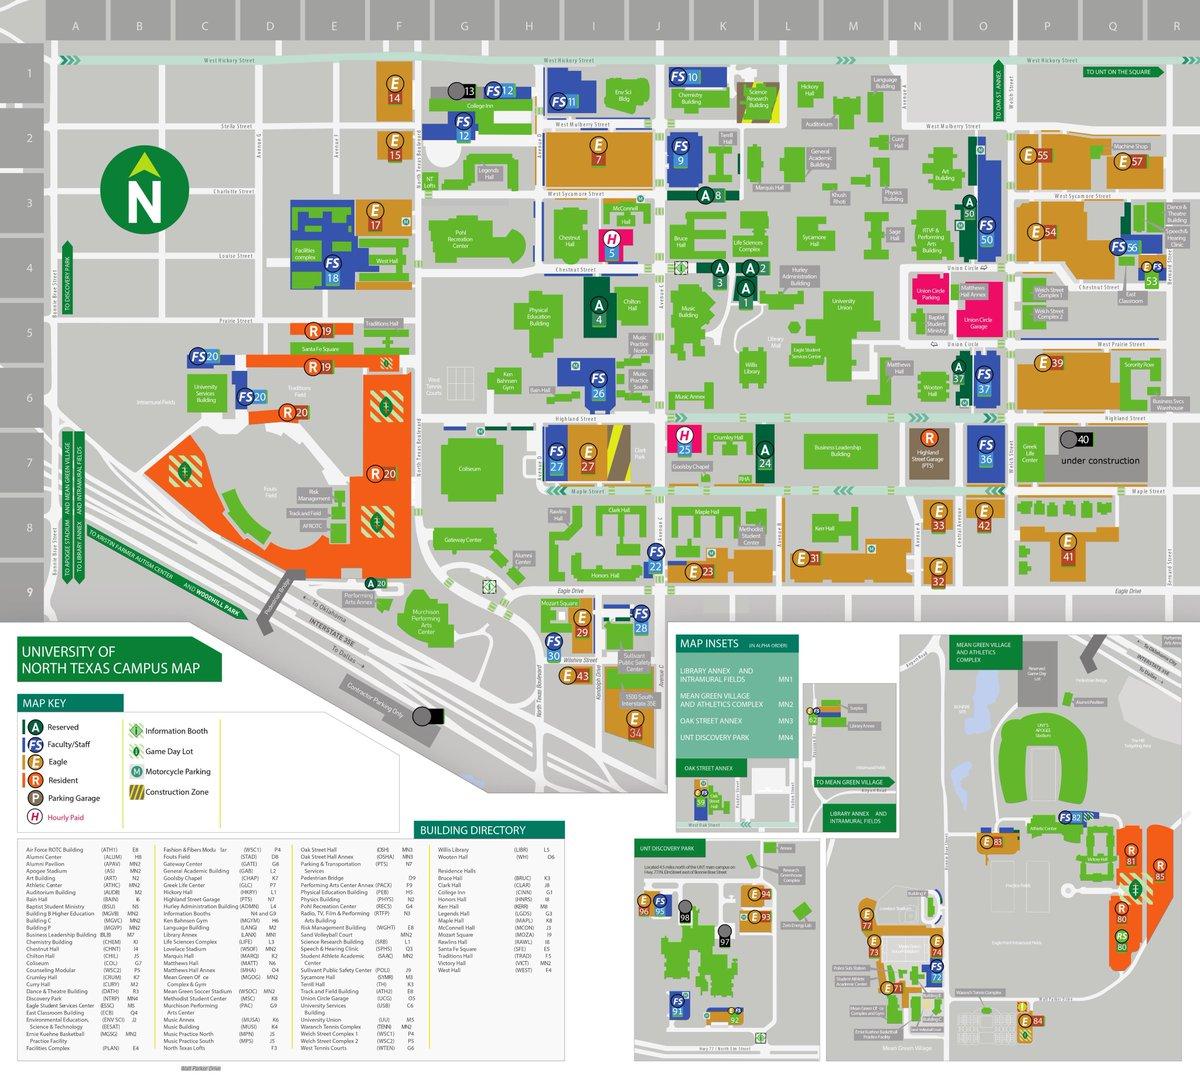 unt campus map 2016 Unt College Of Music On Twitter Performance Parking Updates